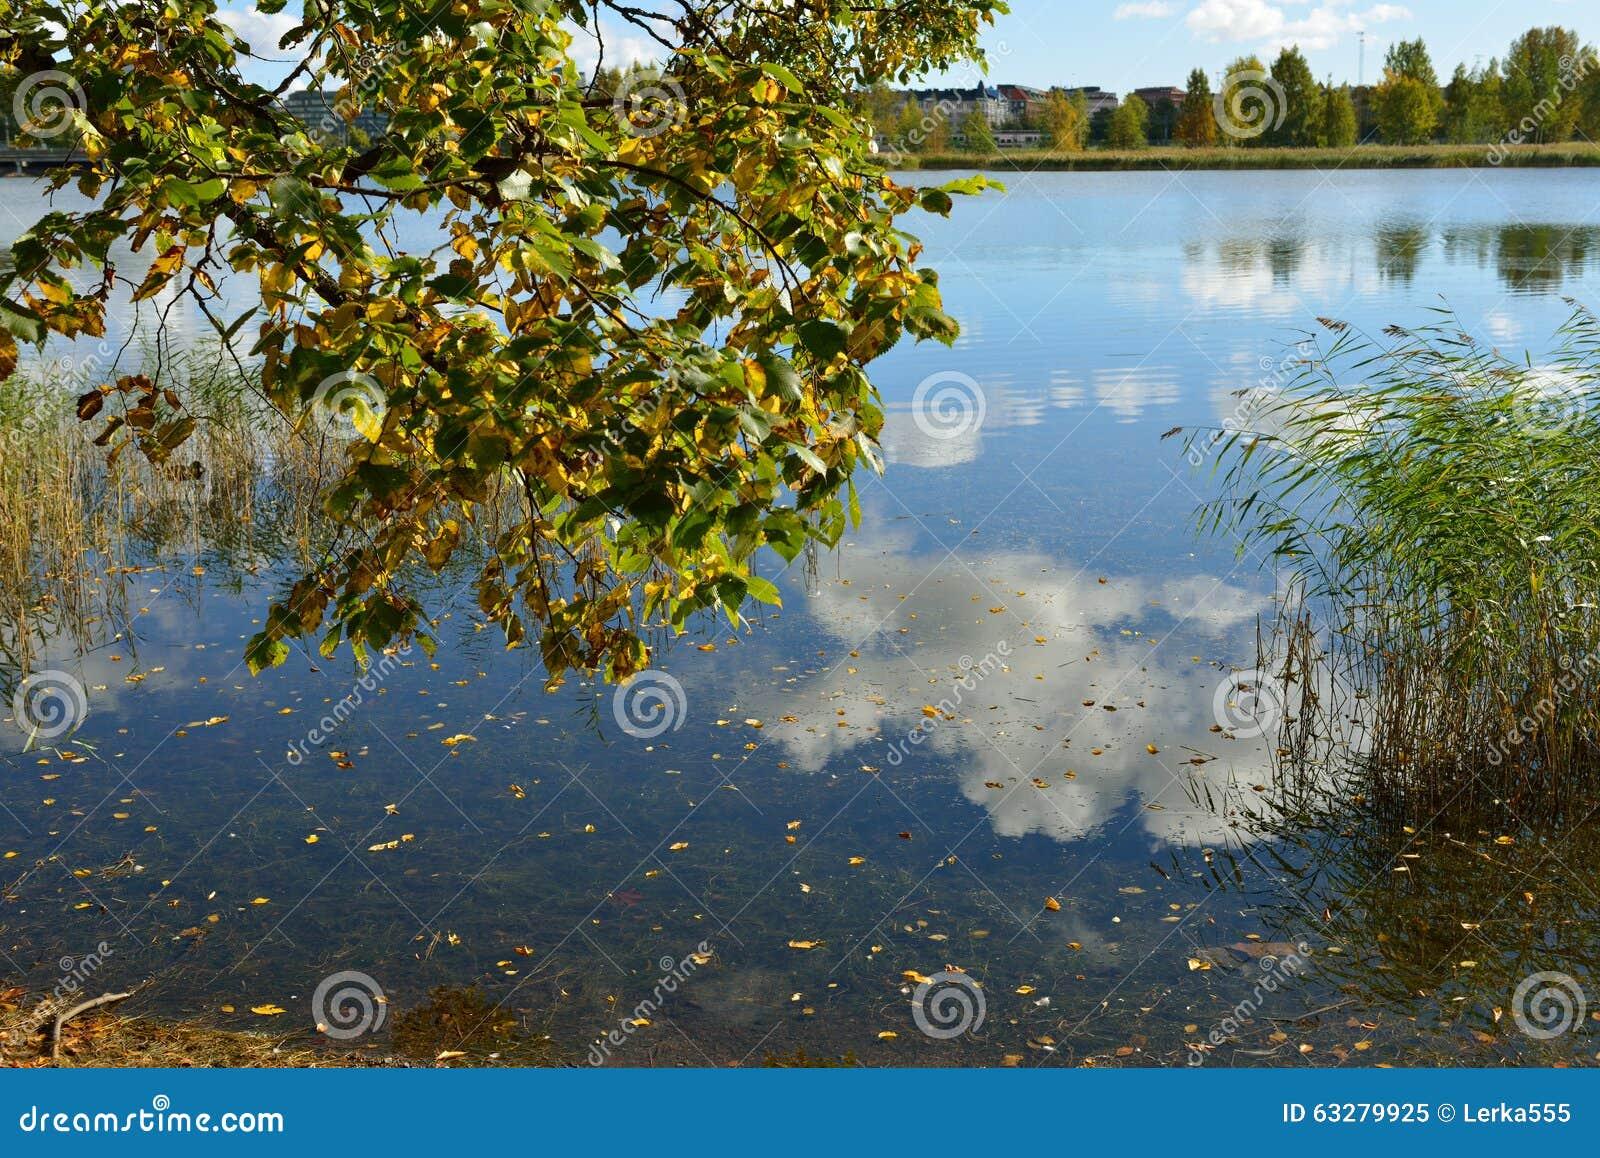 Coast of blue lake golden autumn